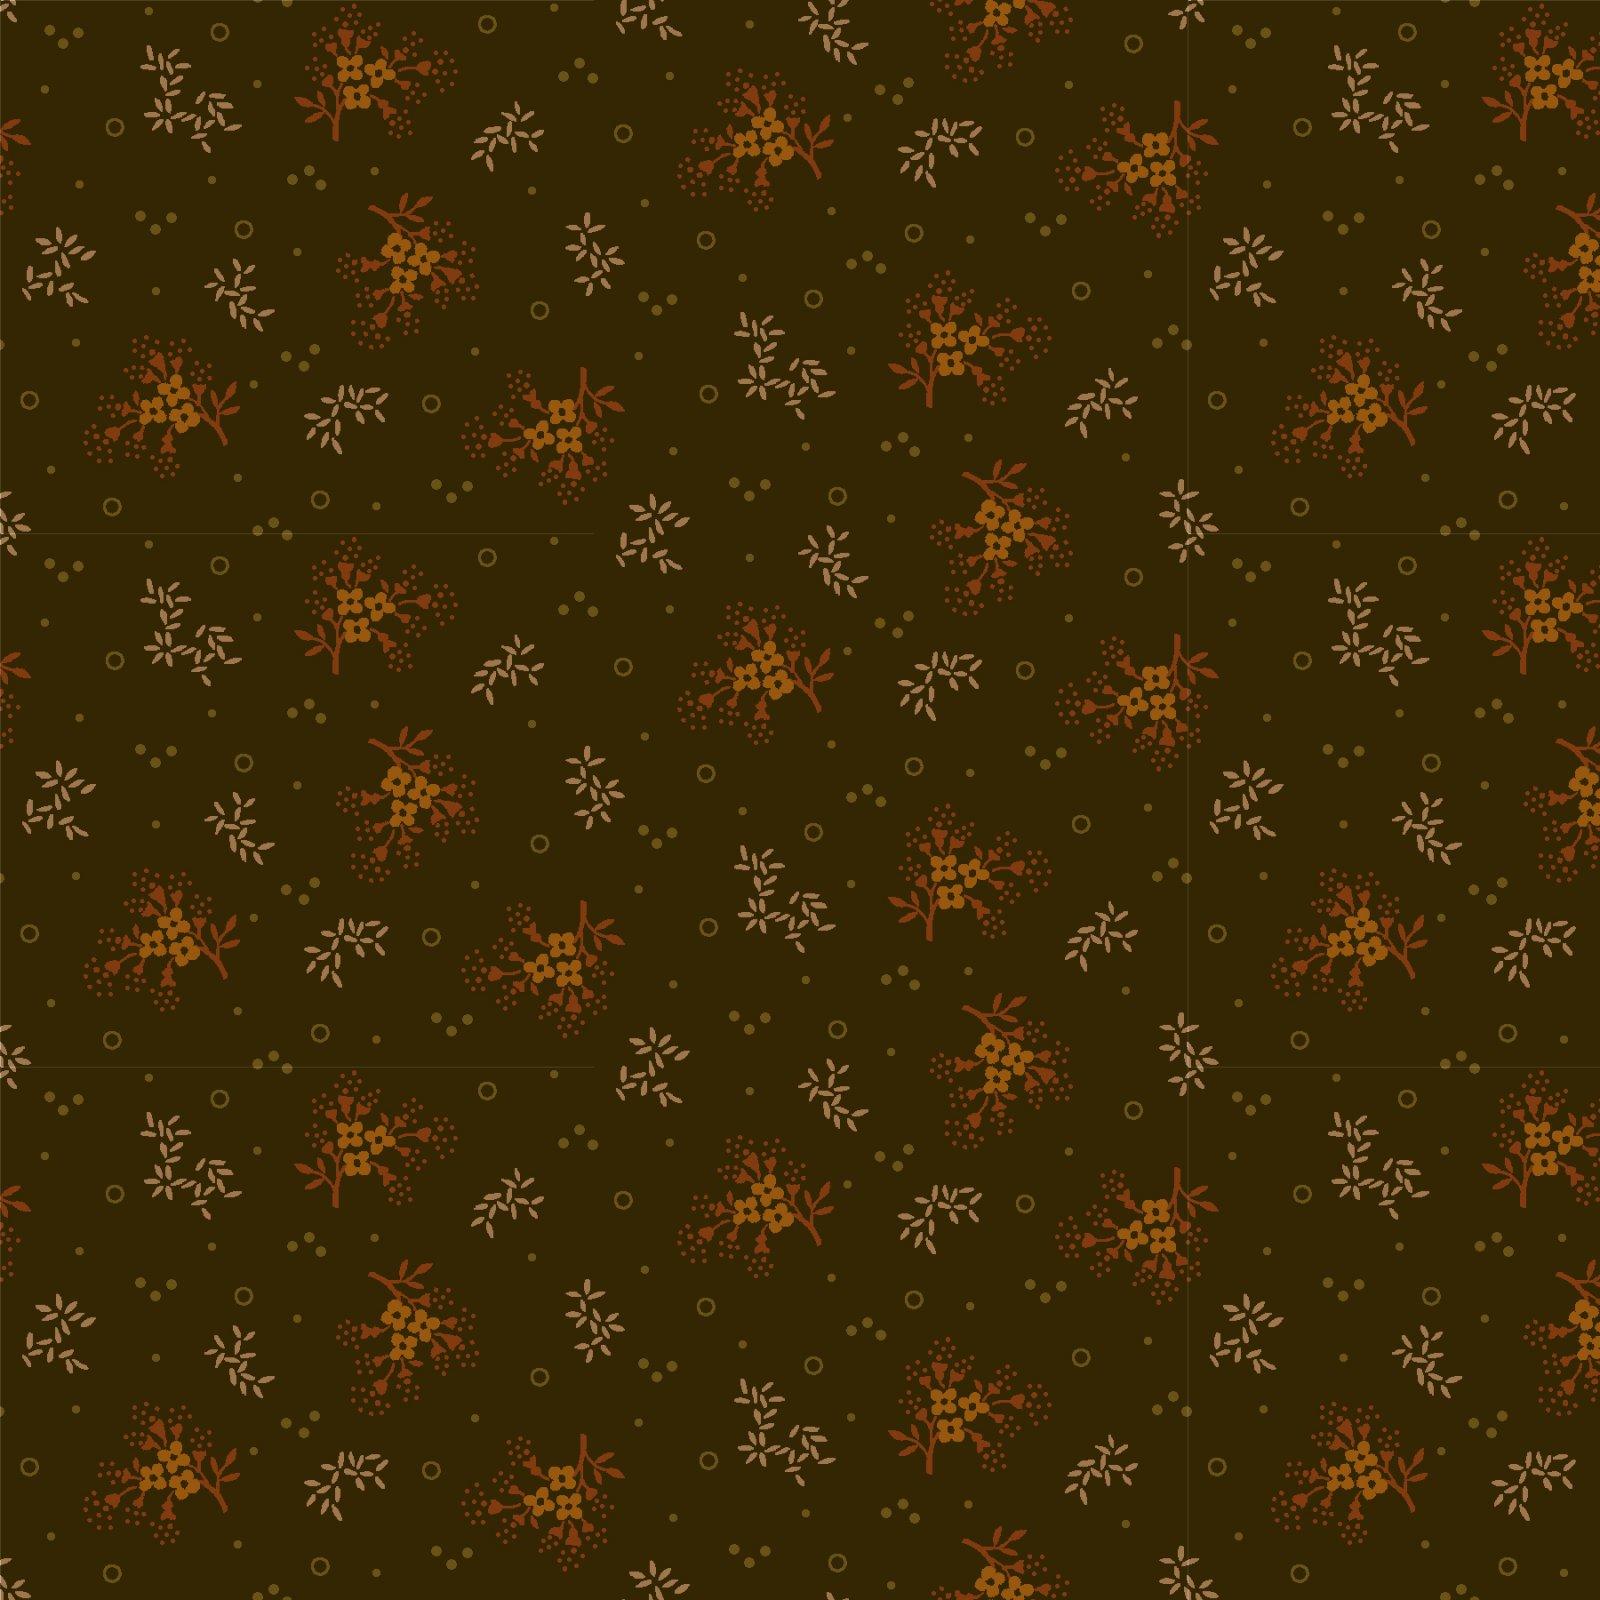 Buttermilk Autumn - 2274-66 * 1/2 yard